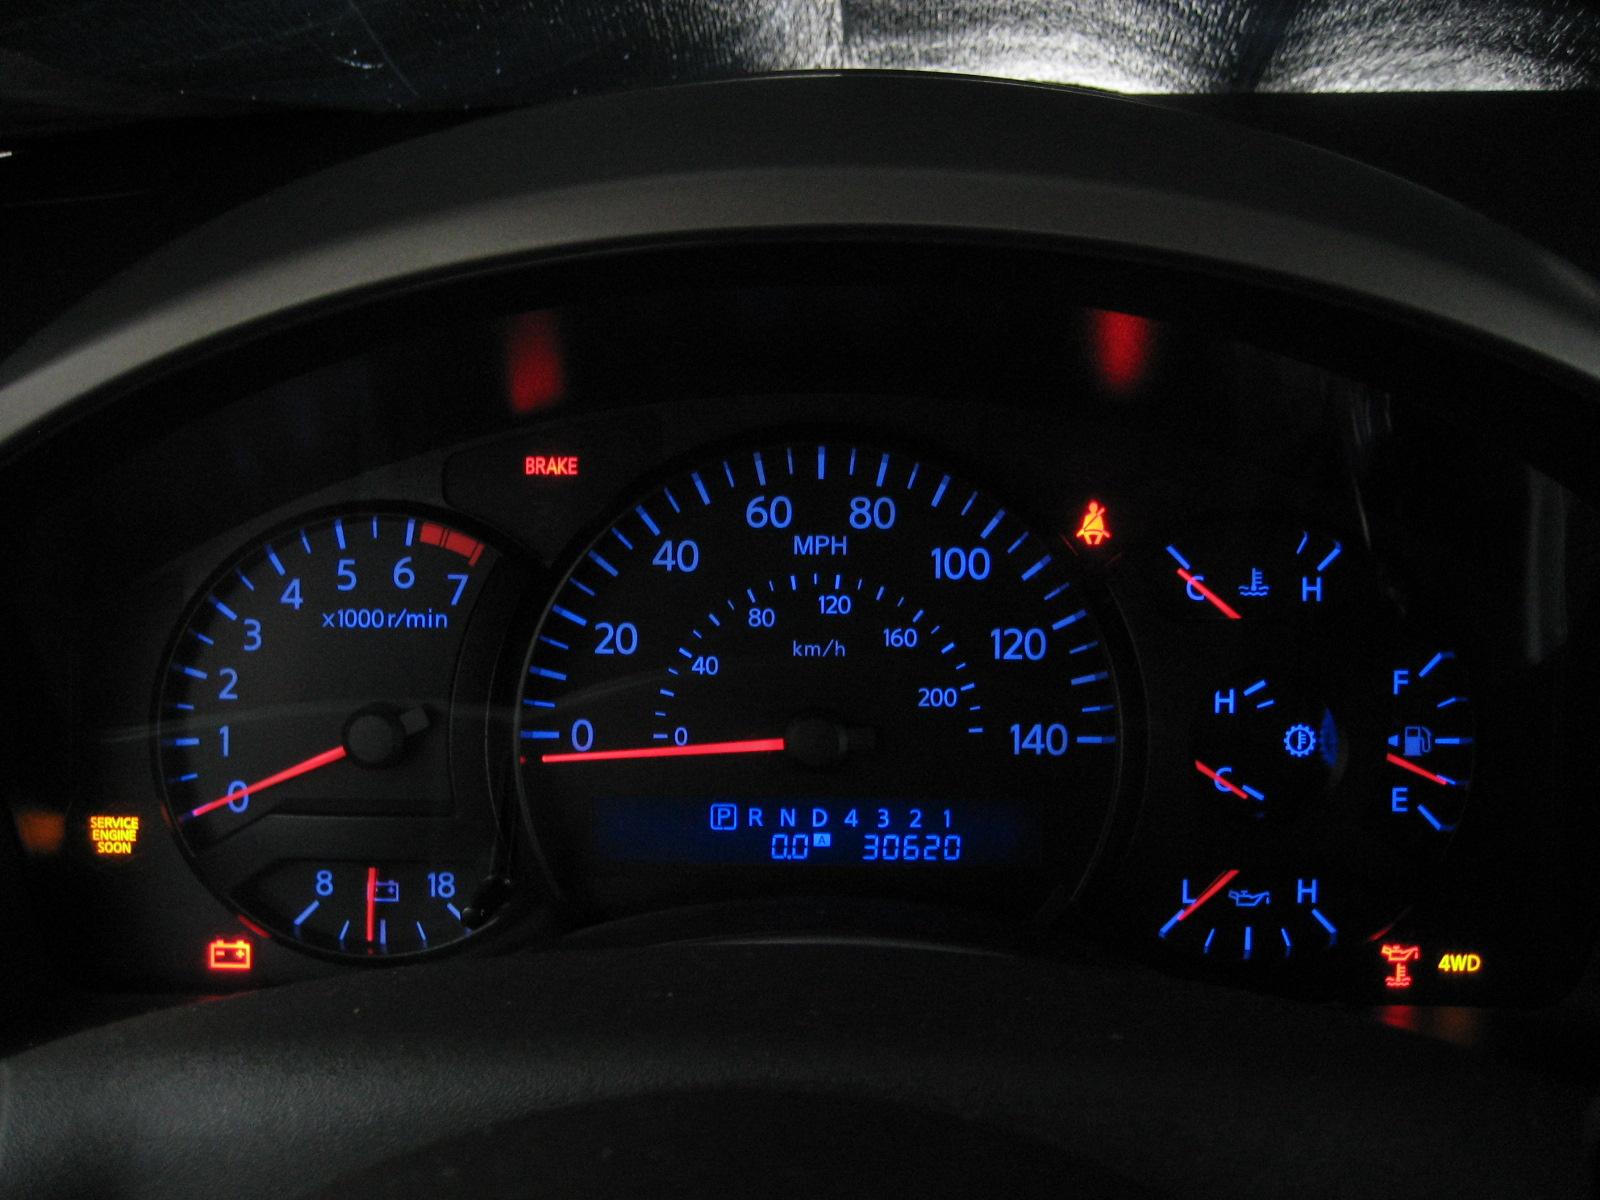 lights to mean transportation light what how cardashboardwarninglightsunderstandingwhattheymean they dash car warning understanding act community dashboard infographic